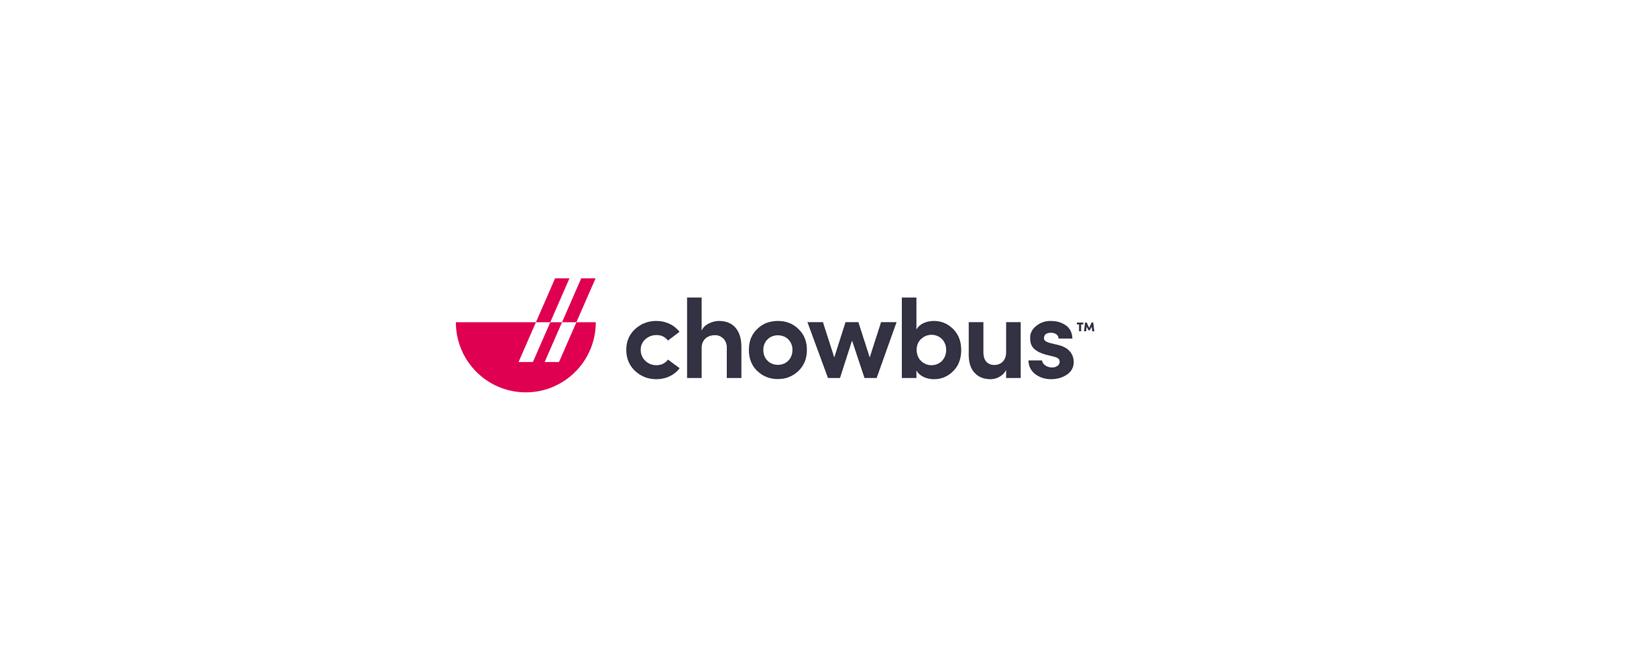 Chowbus Discount Code 2021